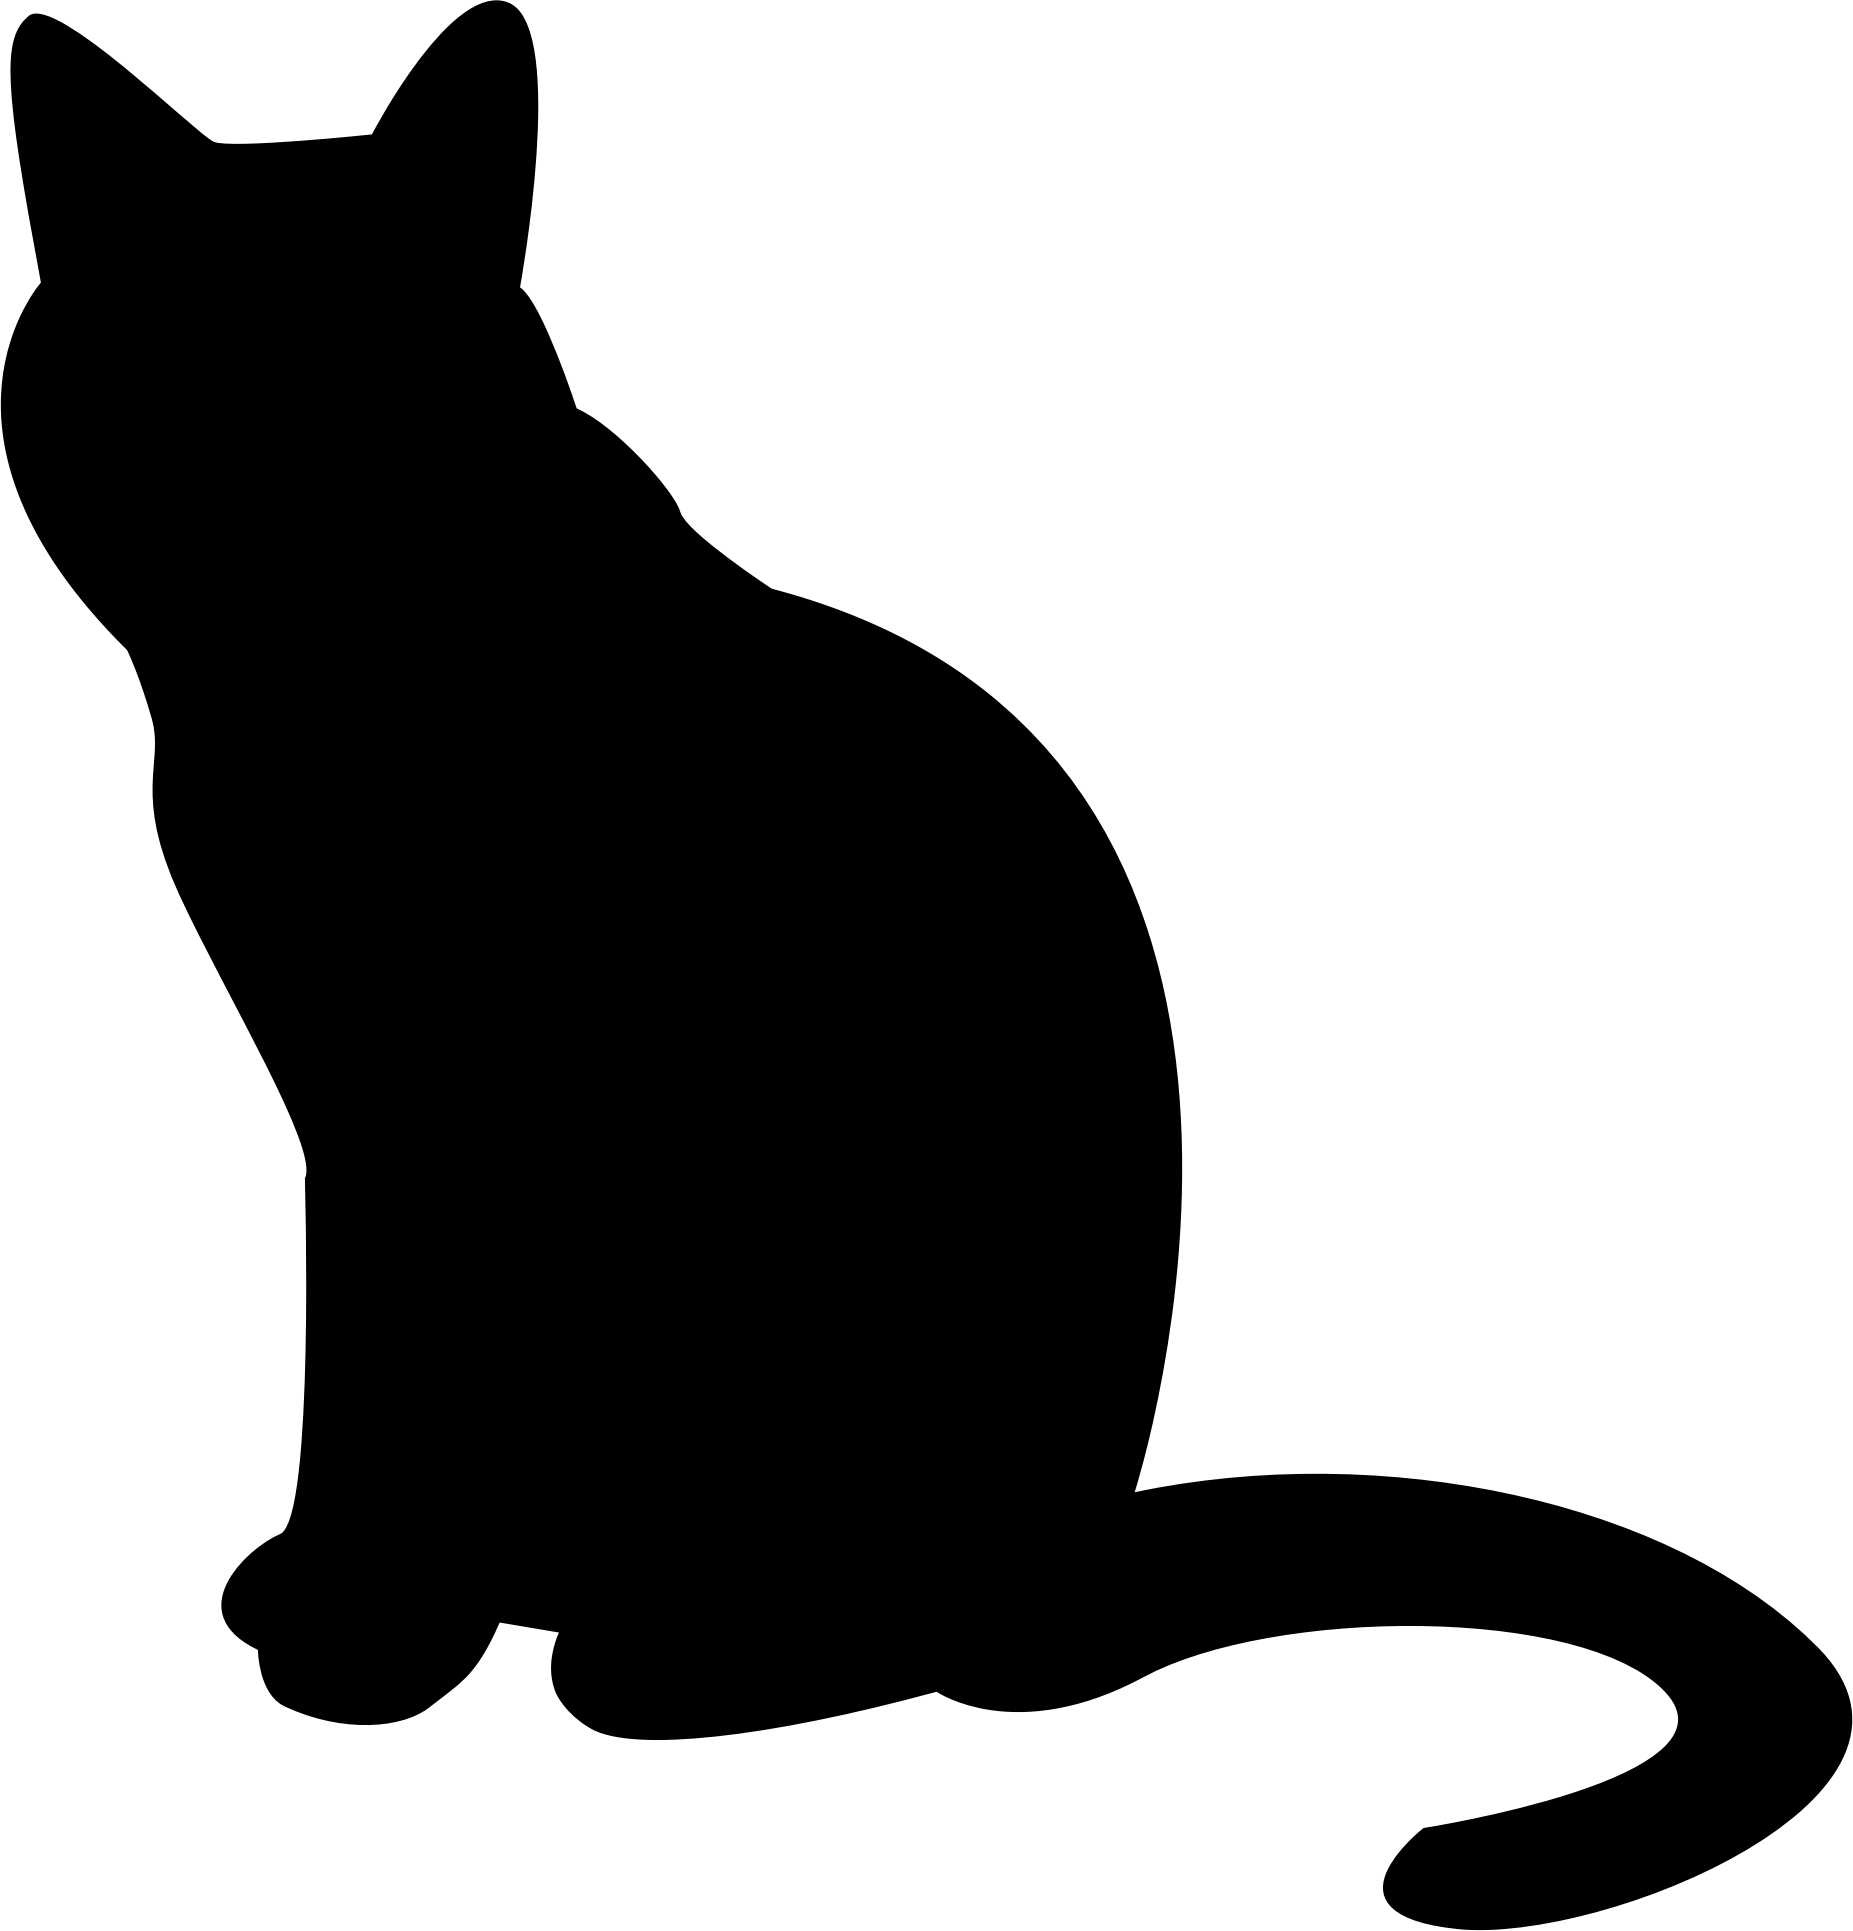 Cat Silhouette transparent PNG.